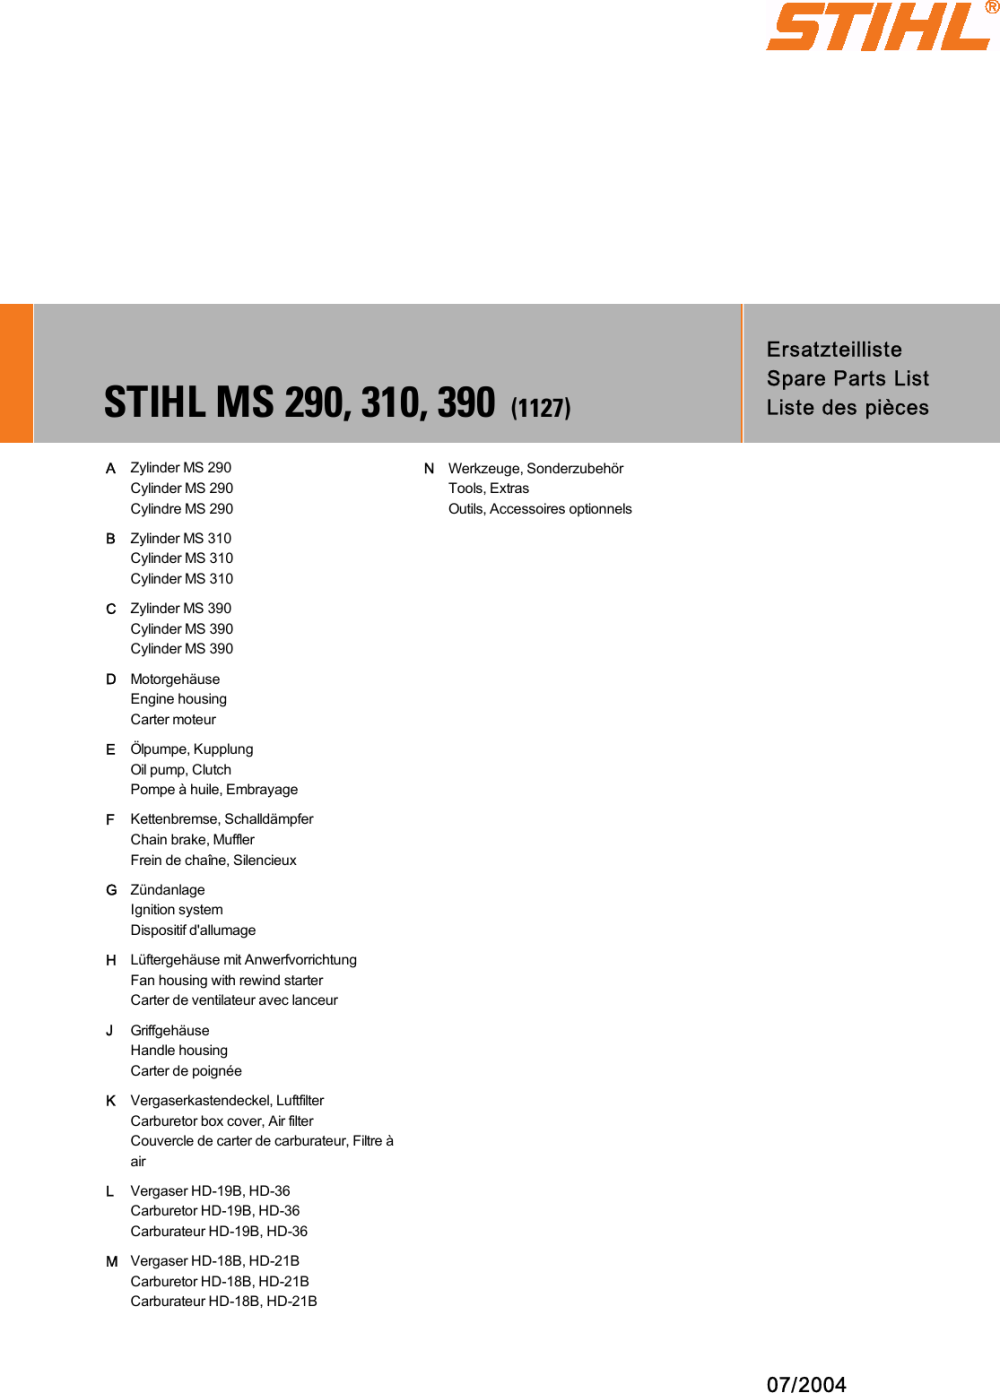 medium resolution of stihl ms 290 farm boss parts list manualslib makes it easy to find manuals online